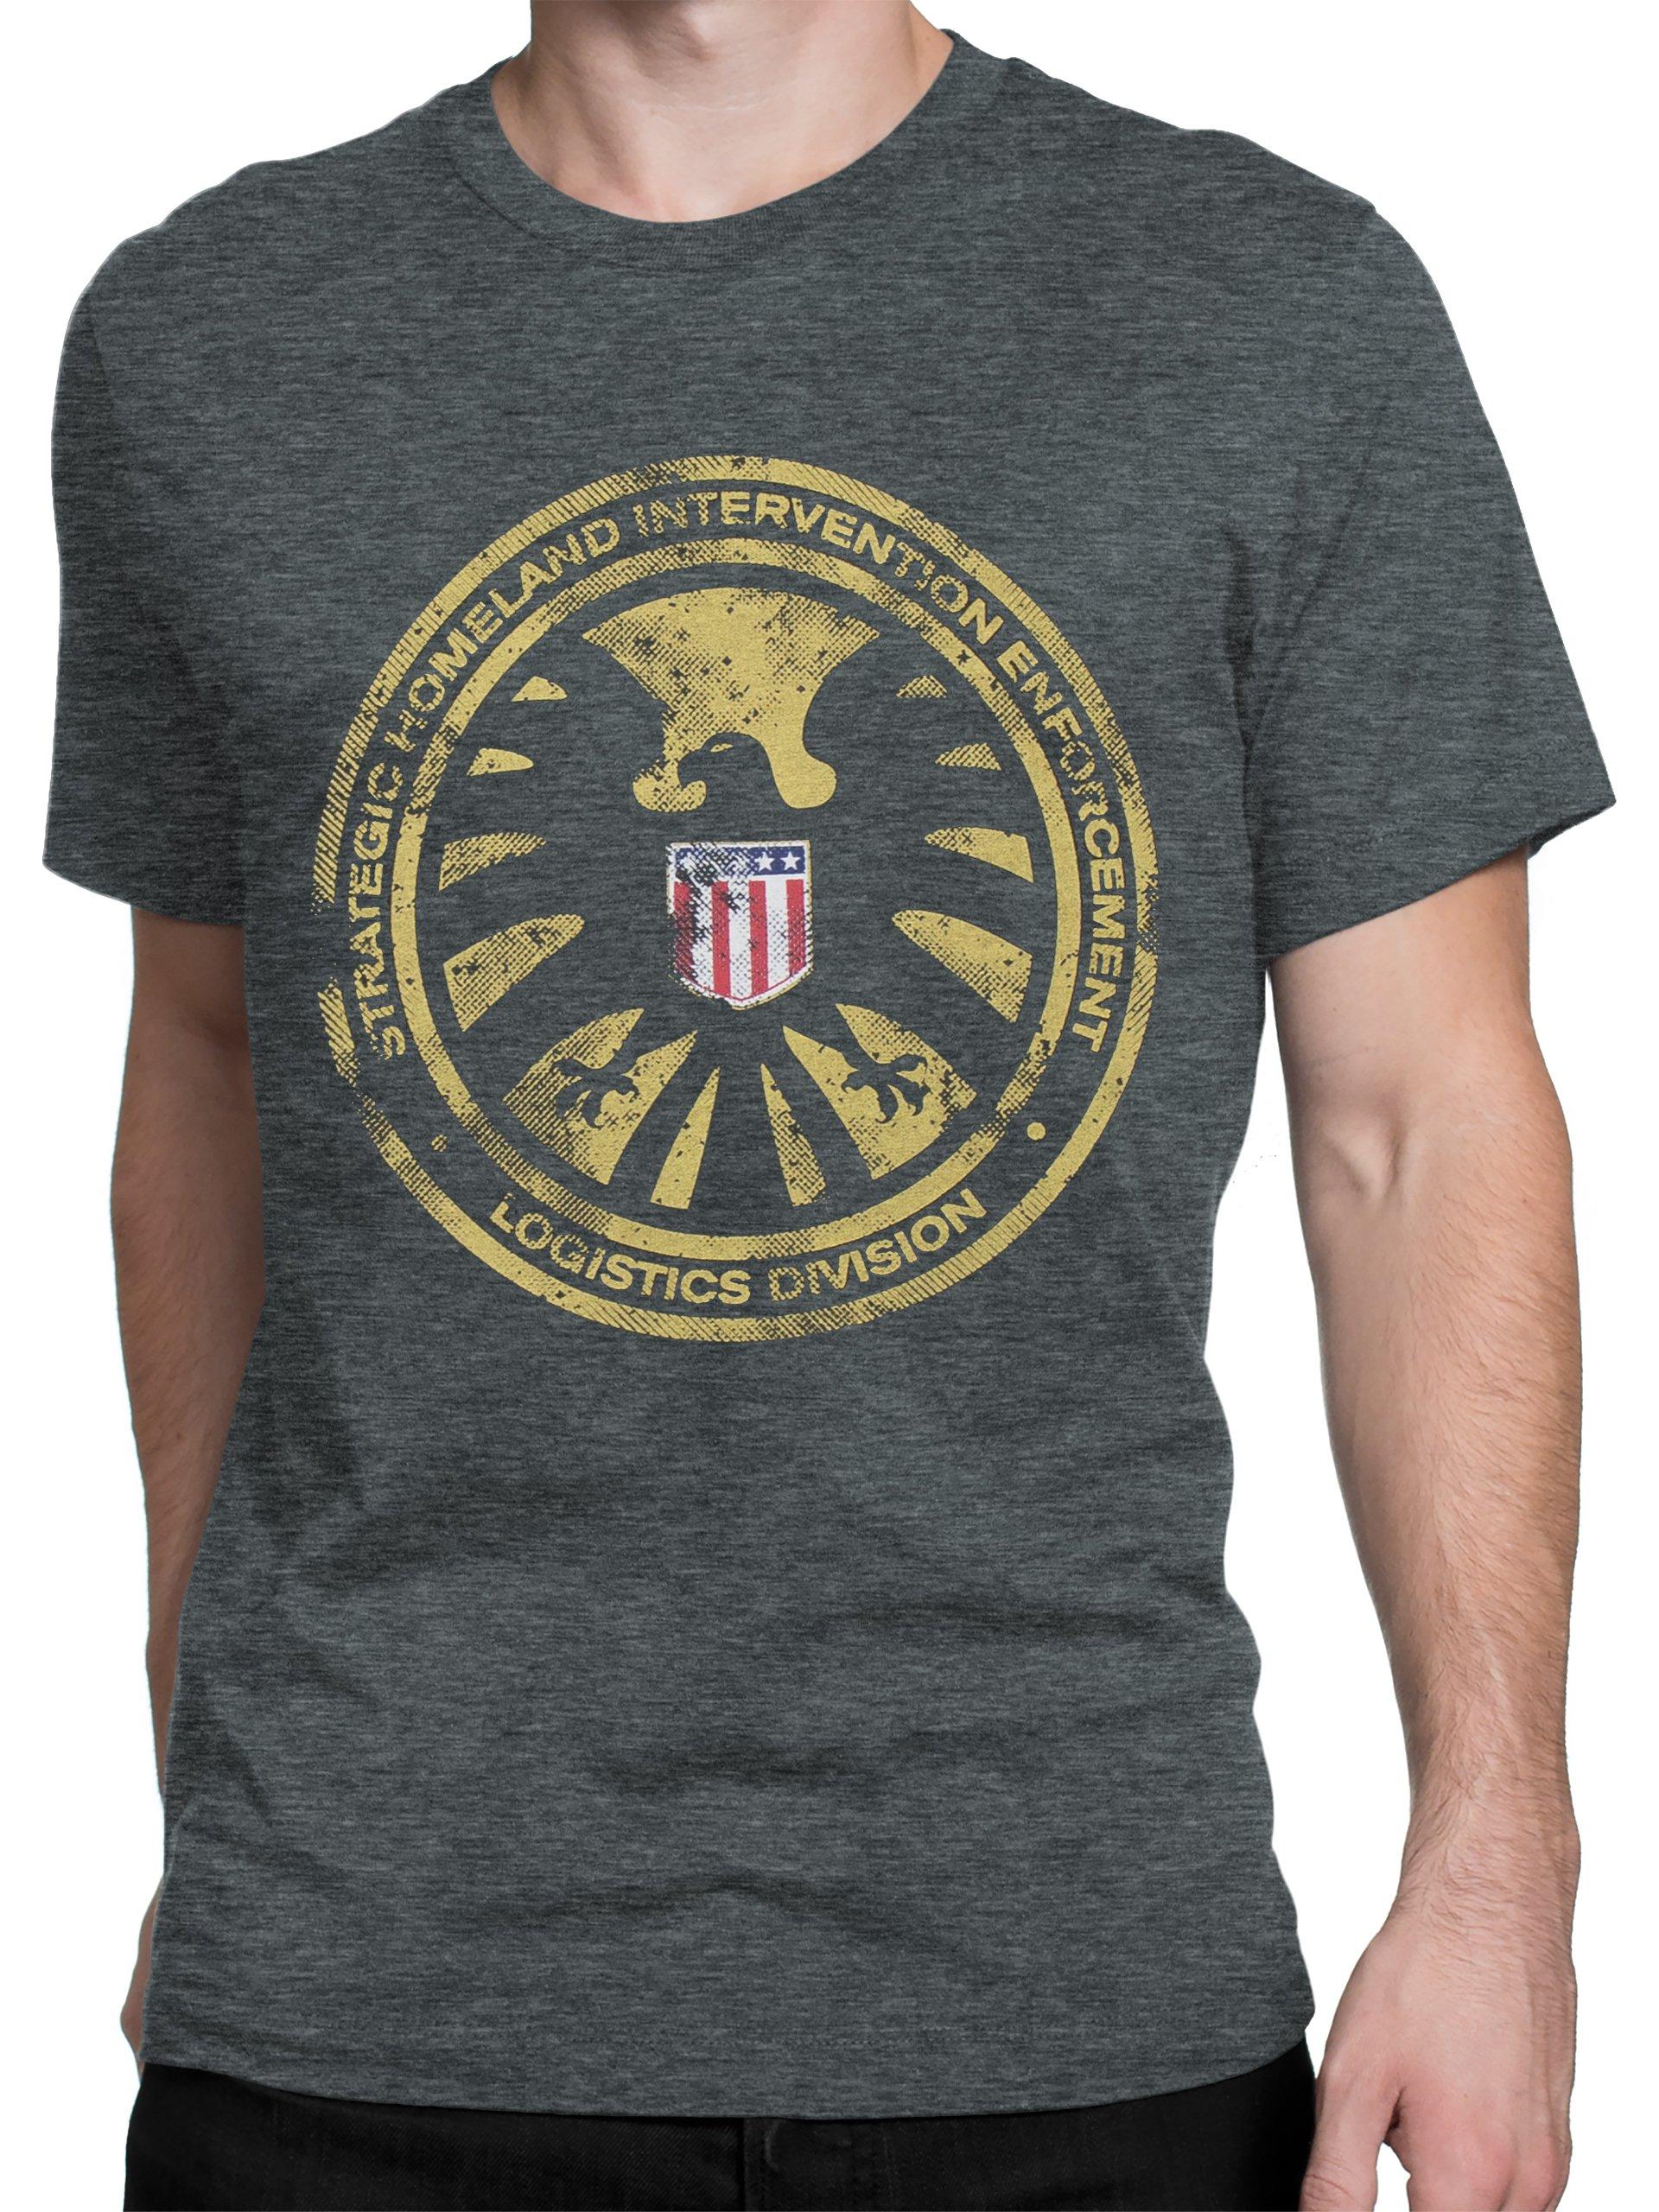 Avengers Marvel Camiseta para Hombre S.H.I.E.L.D product image